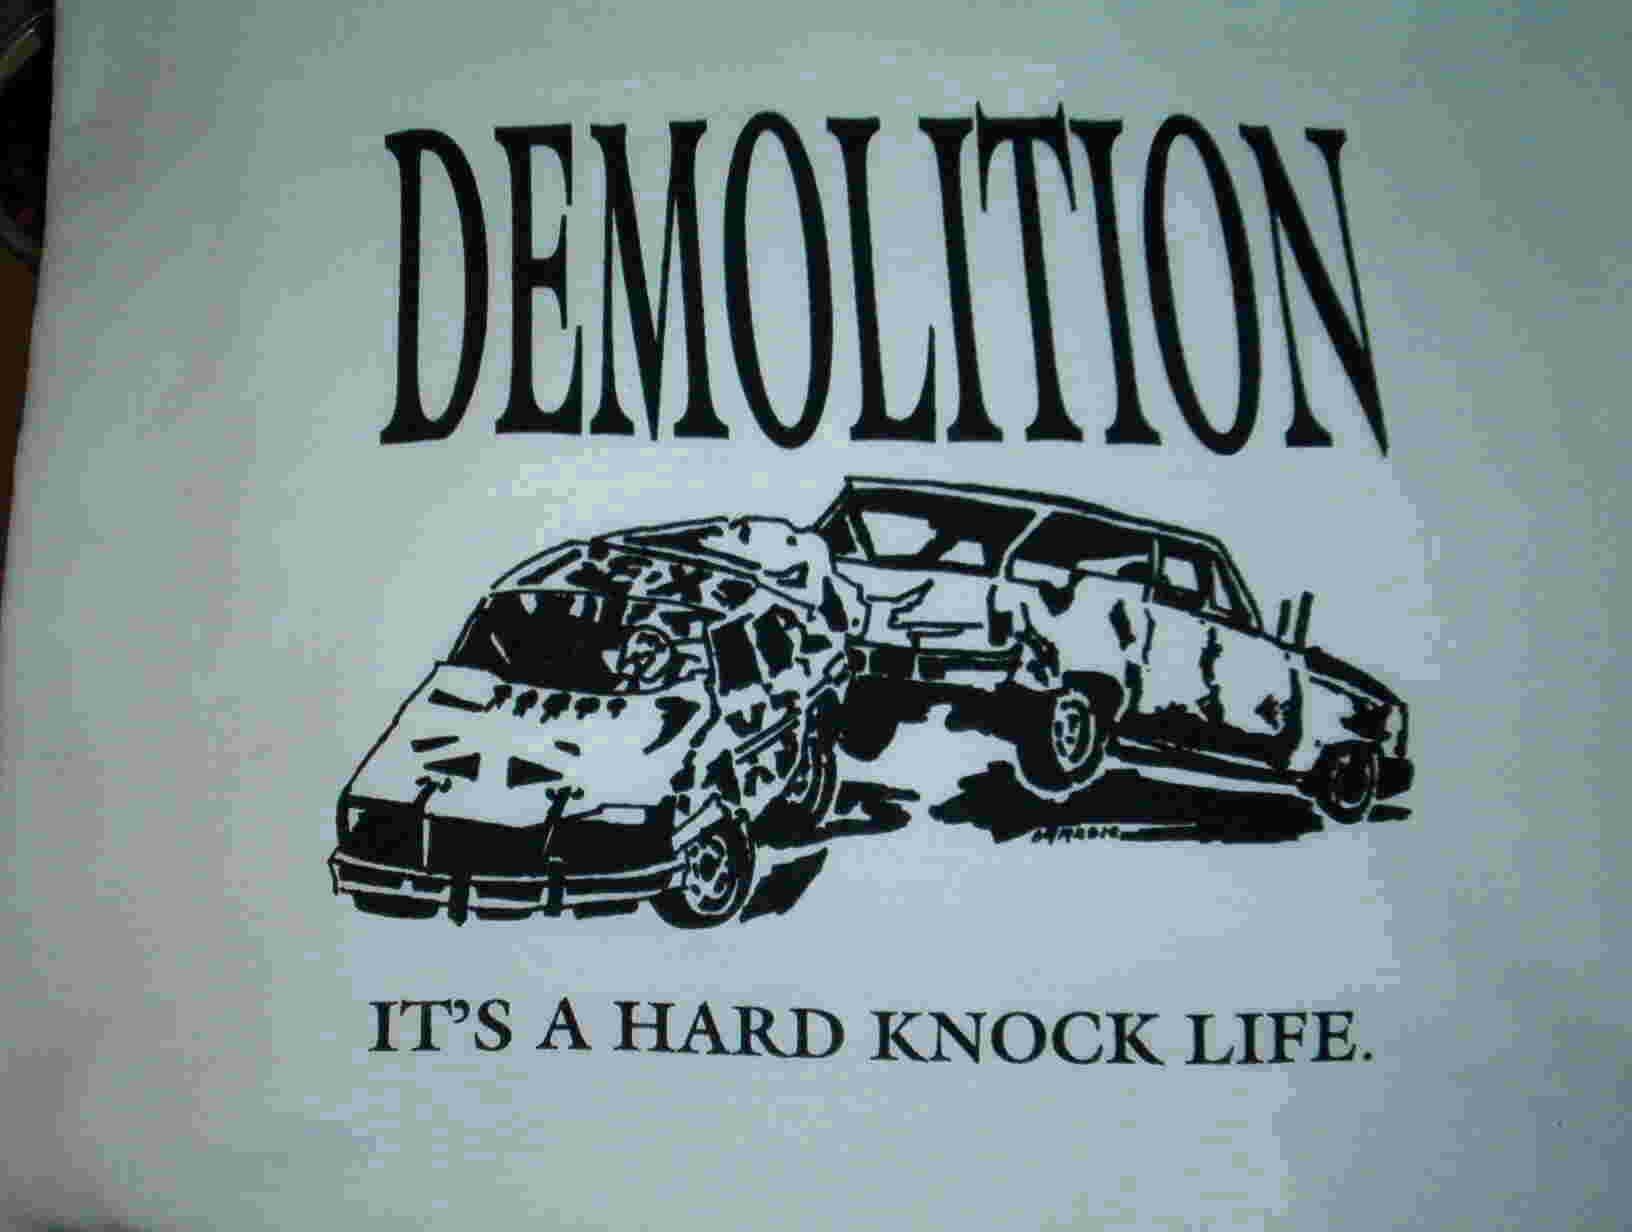 Free clipart demolition.